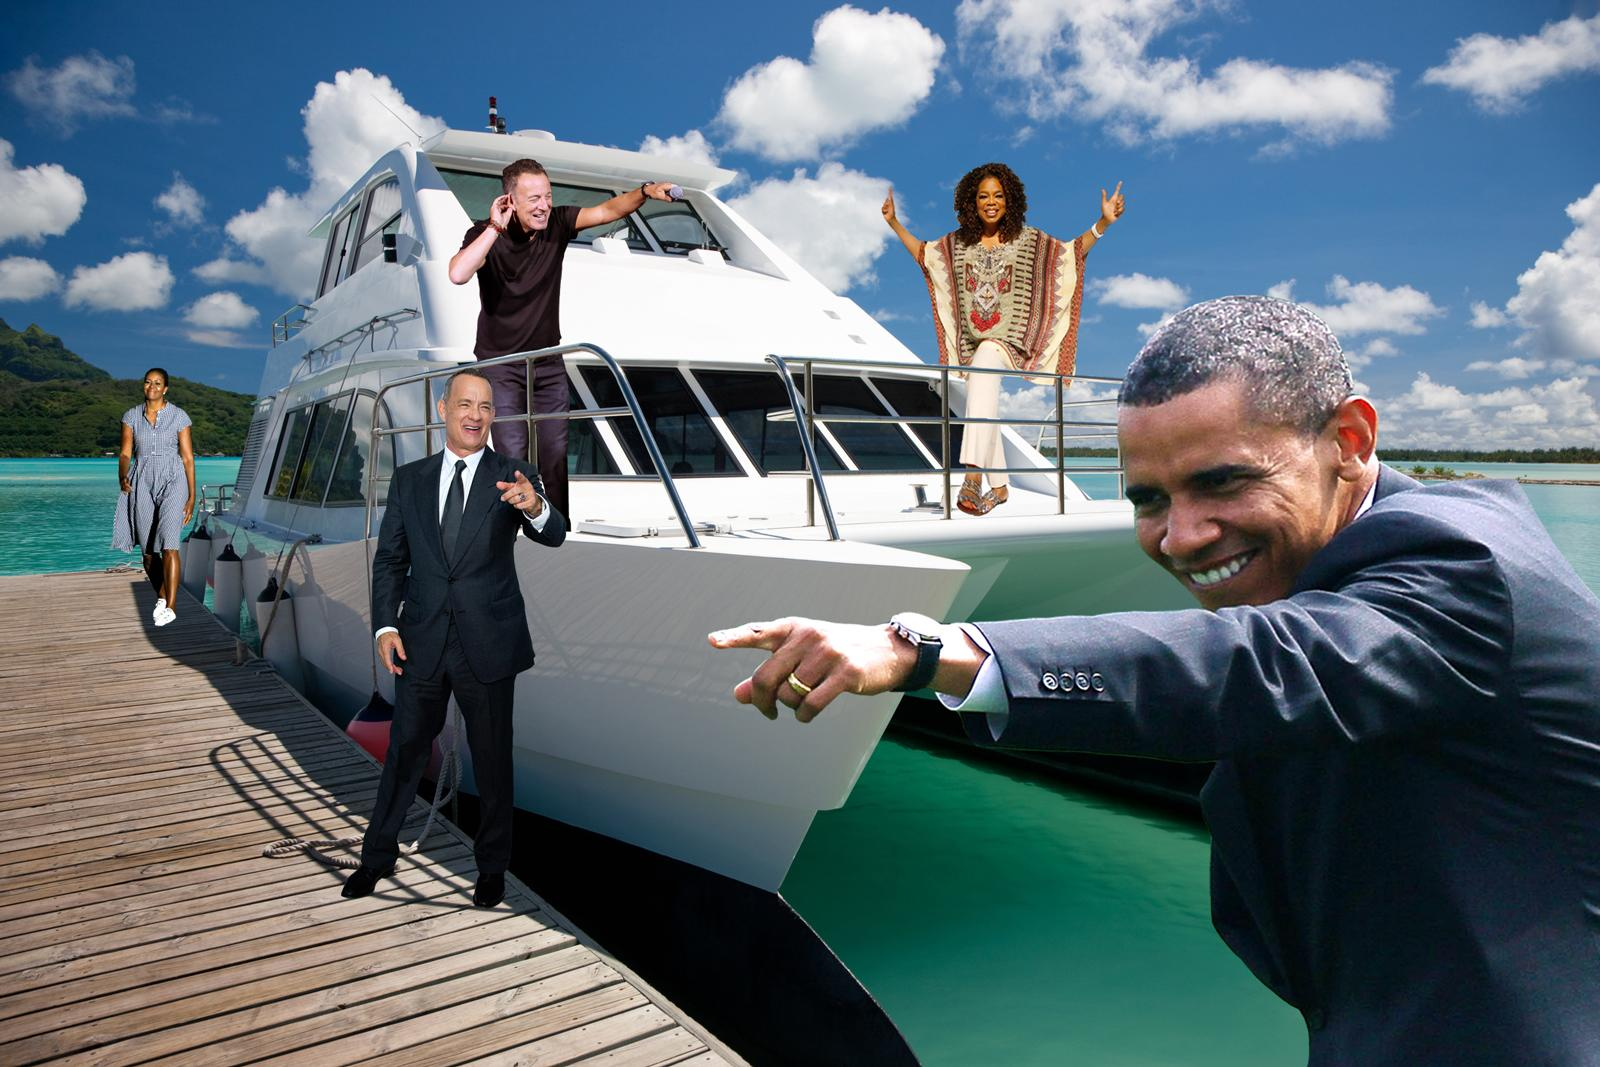 Obama, Oprah, Tom Hanks, and Bruce Springsteen All Went on Vacation Together